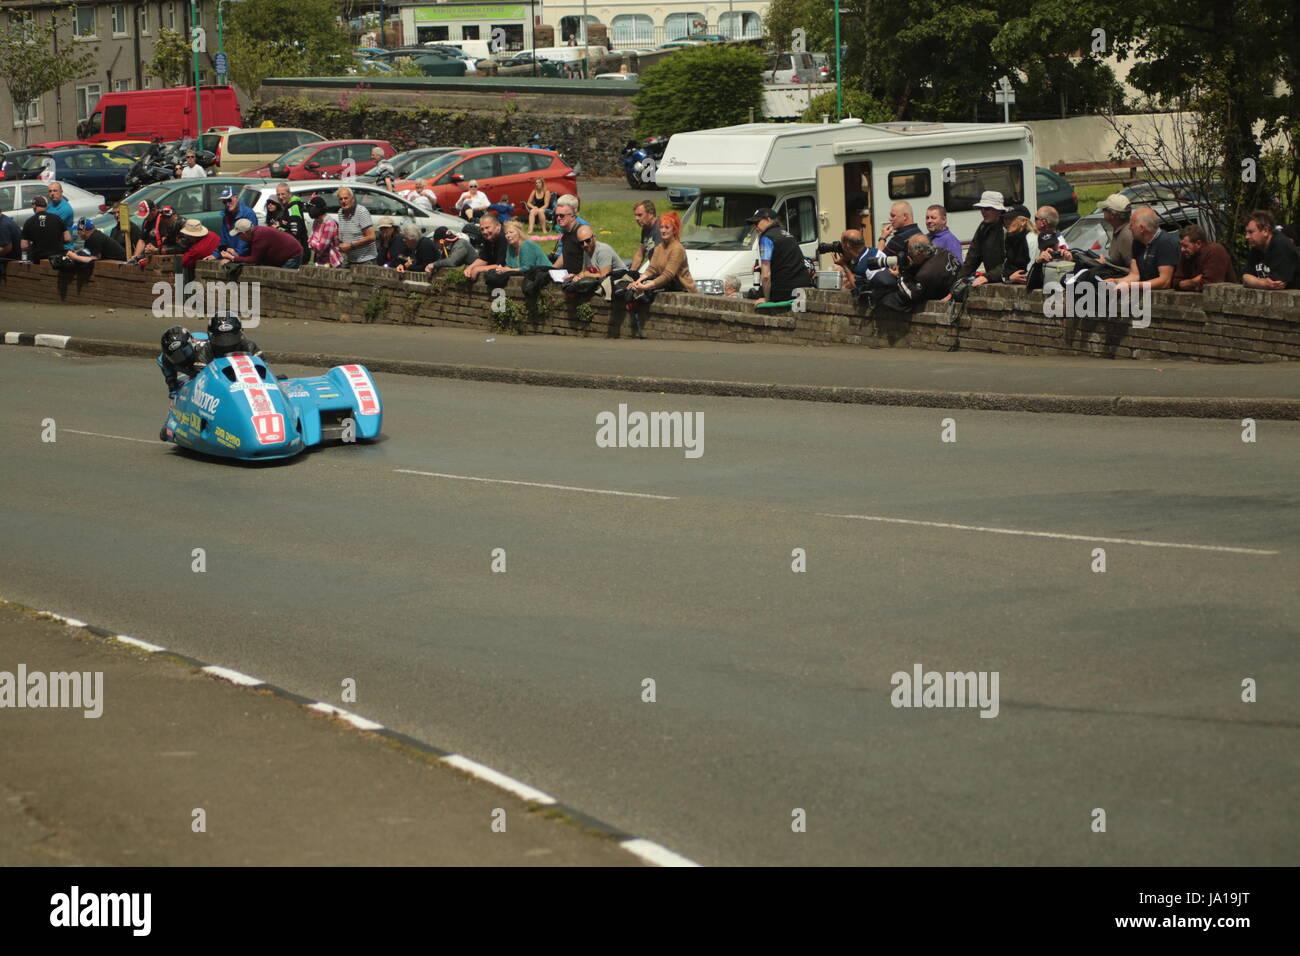 Isle Of Man TT Races, Beiwagen Praxis Qualifikationsrennen, Samstag, 3. Juni 2017. Beiwagen-qualifying-Session. Stockbild